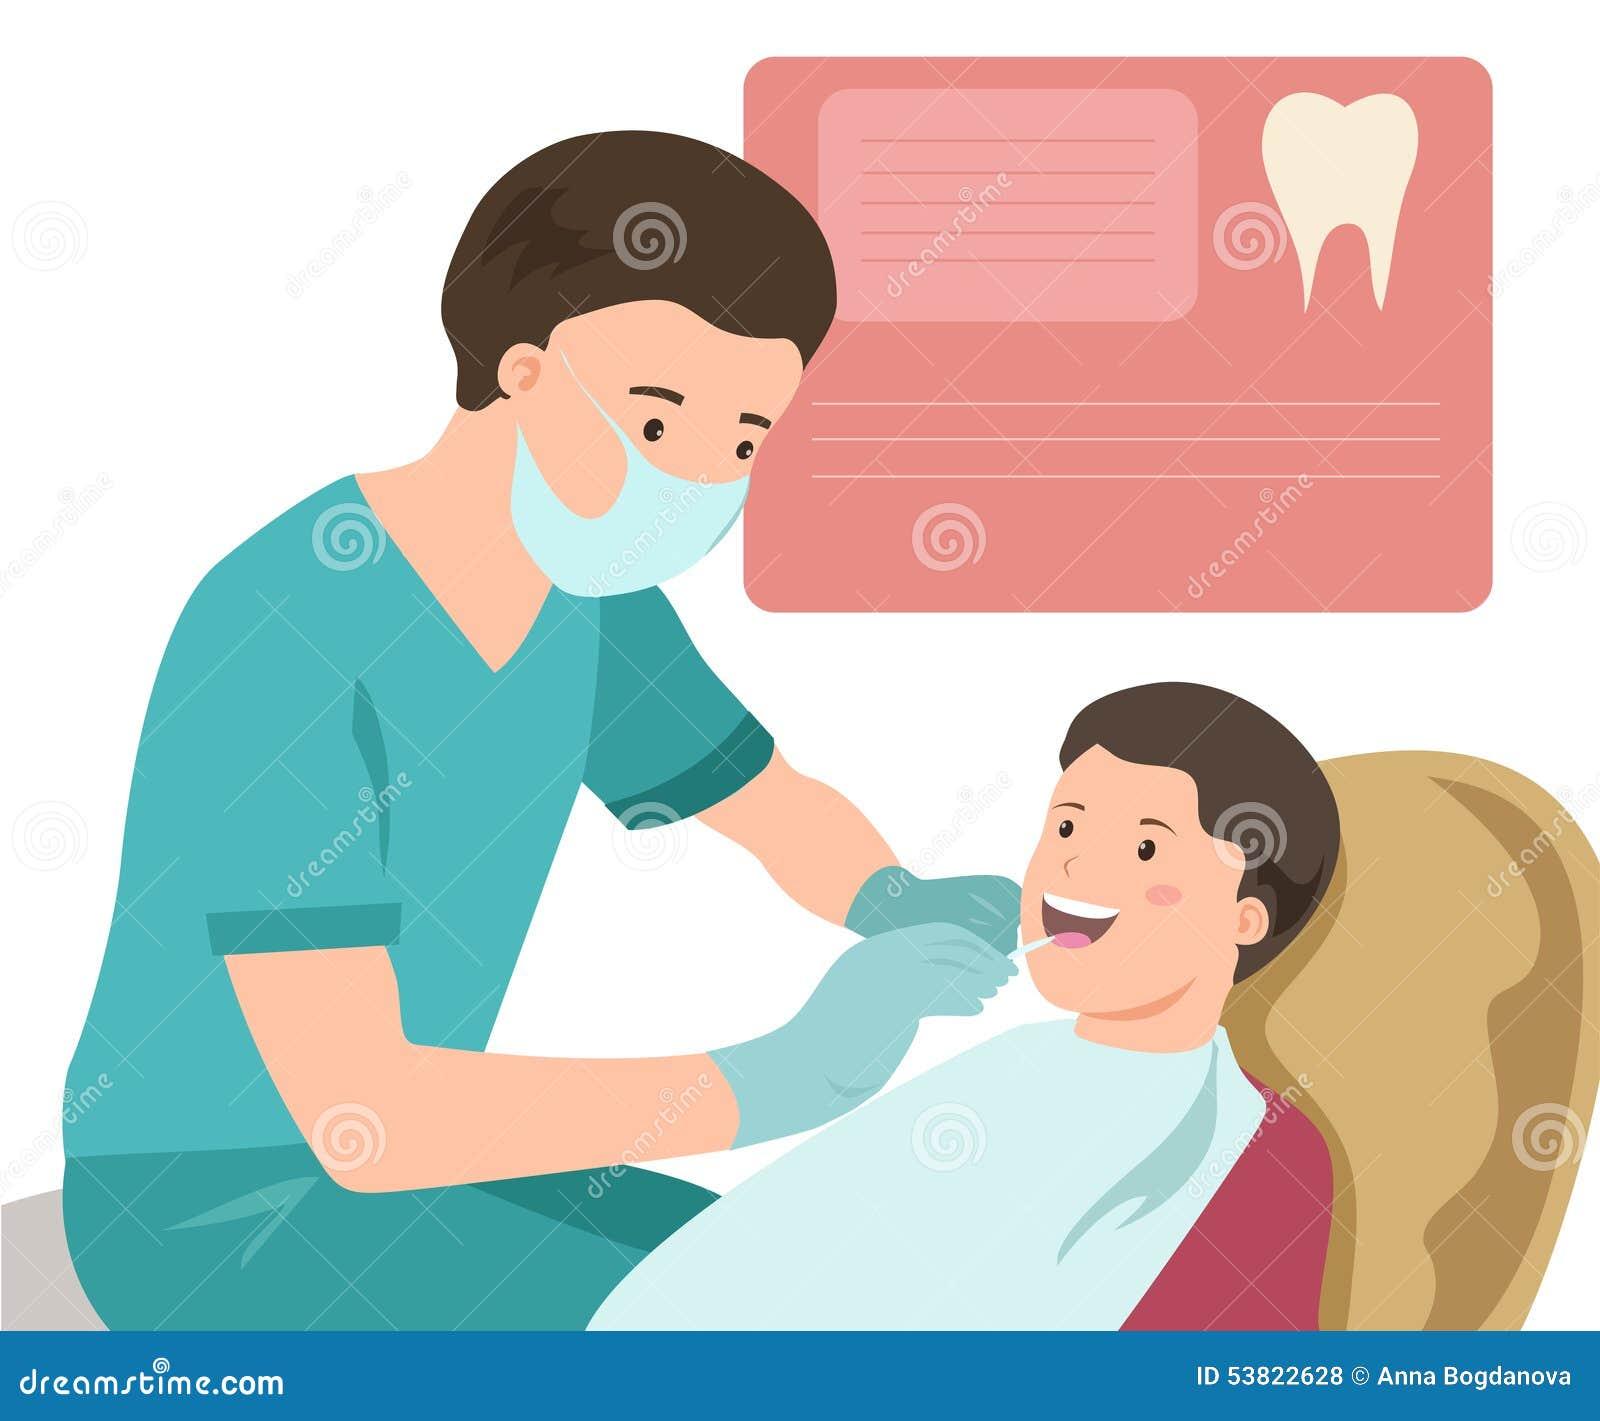 dentist clipart vector - photo #9